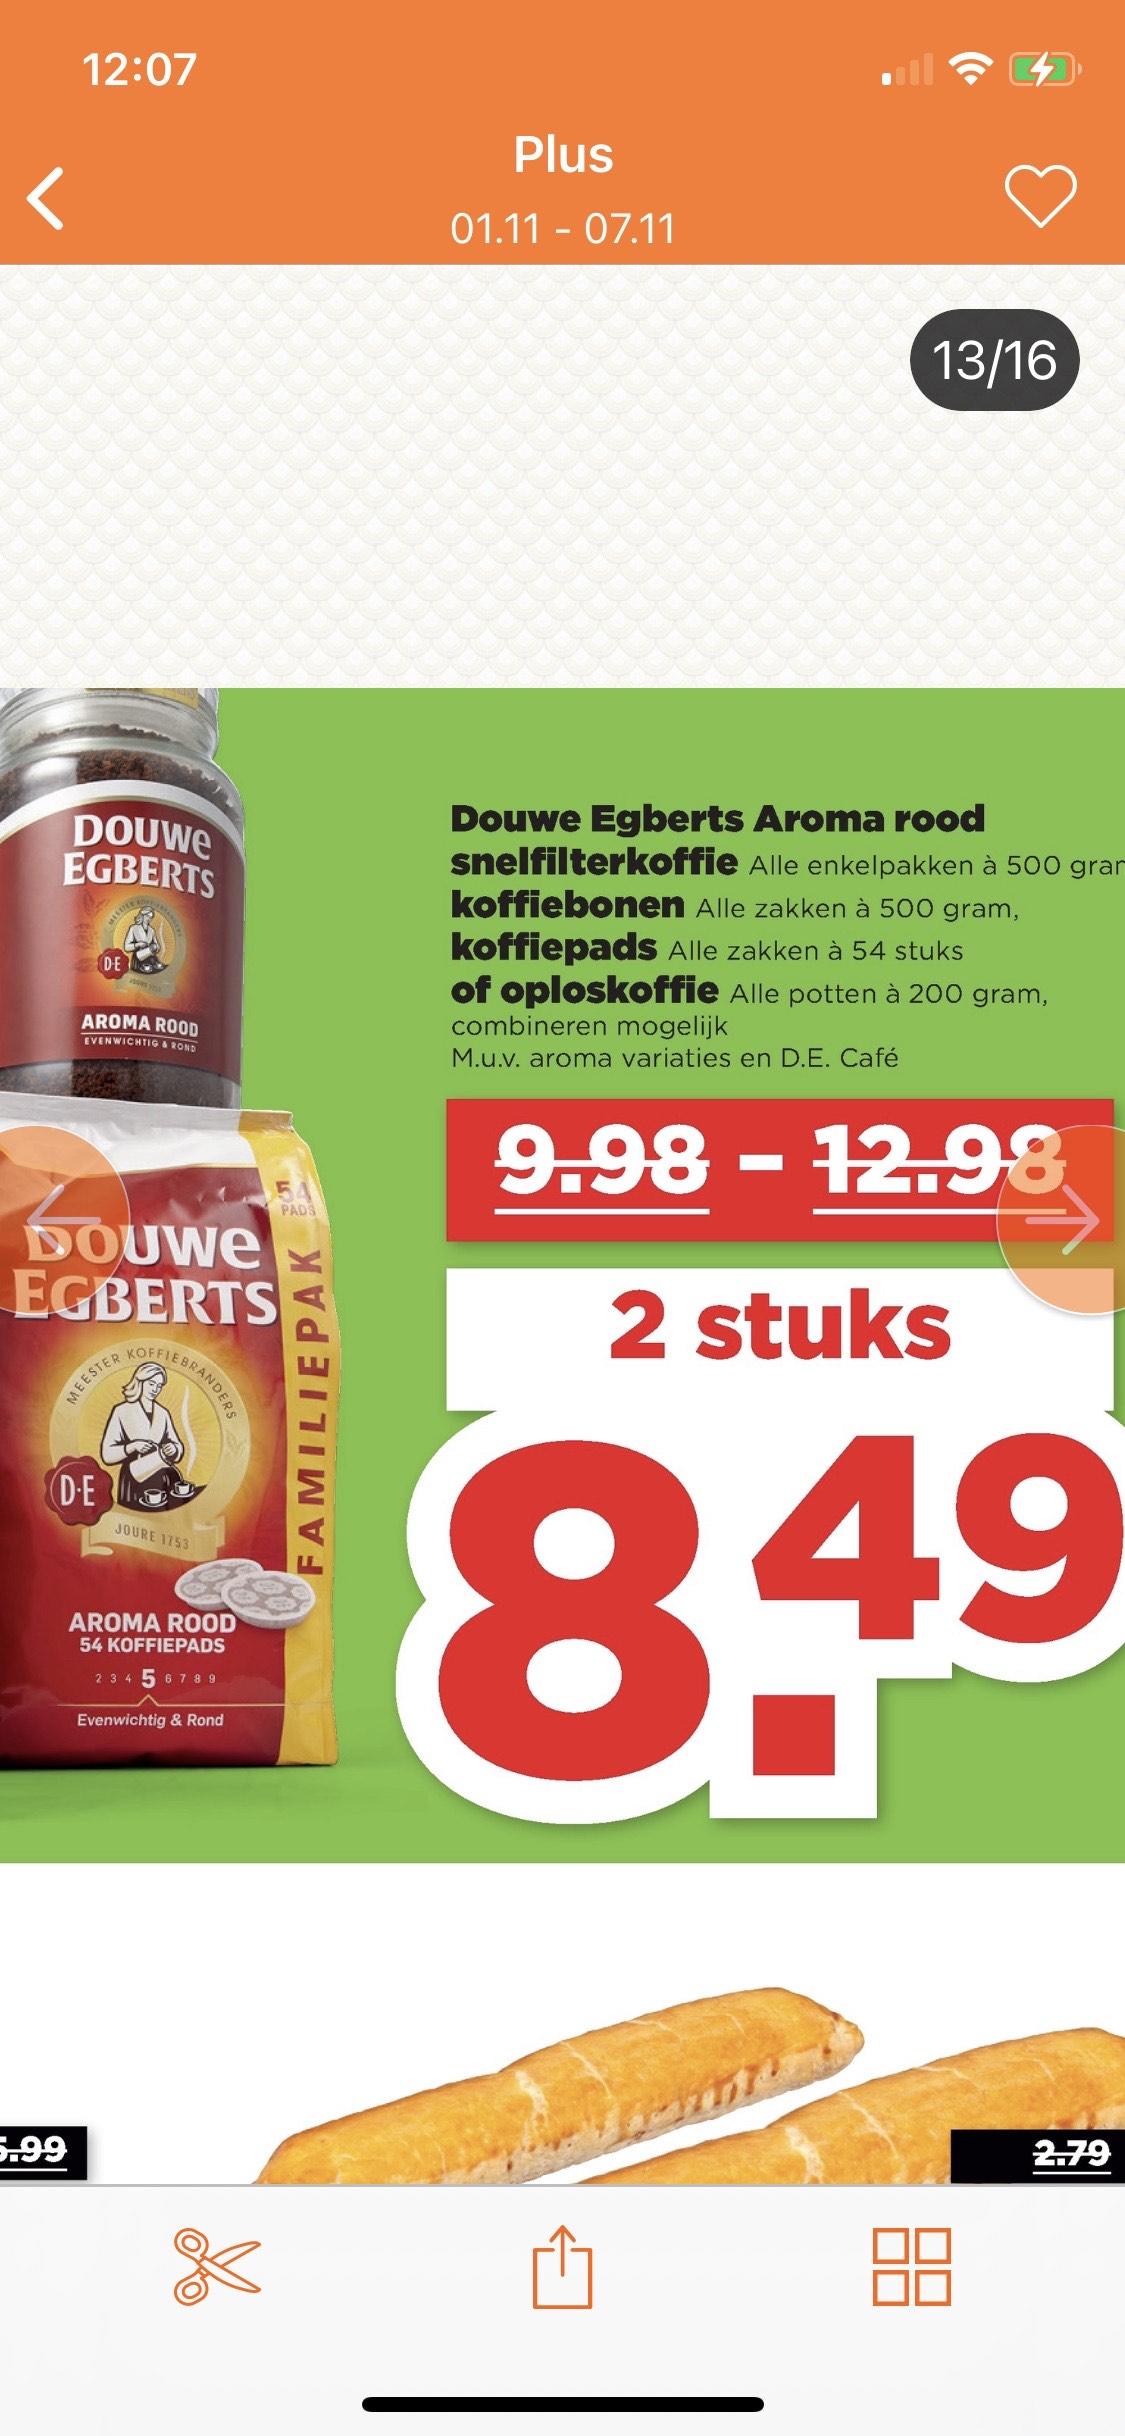 Douwe Egbert koffie 2 stuks €8,45 @Plus